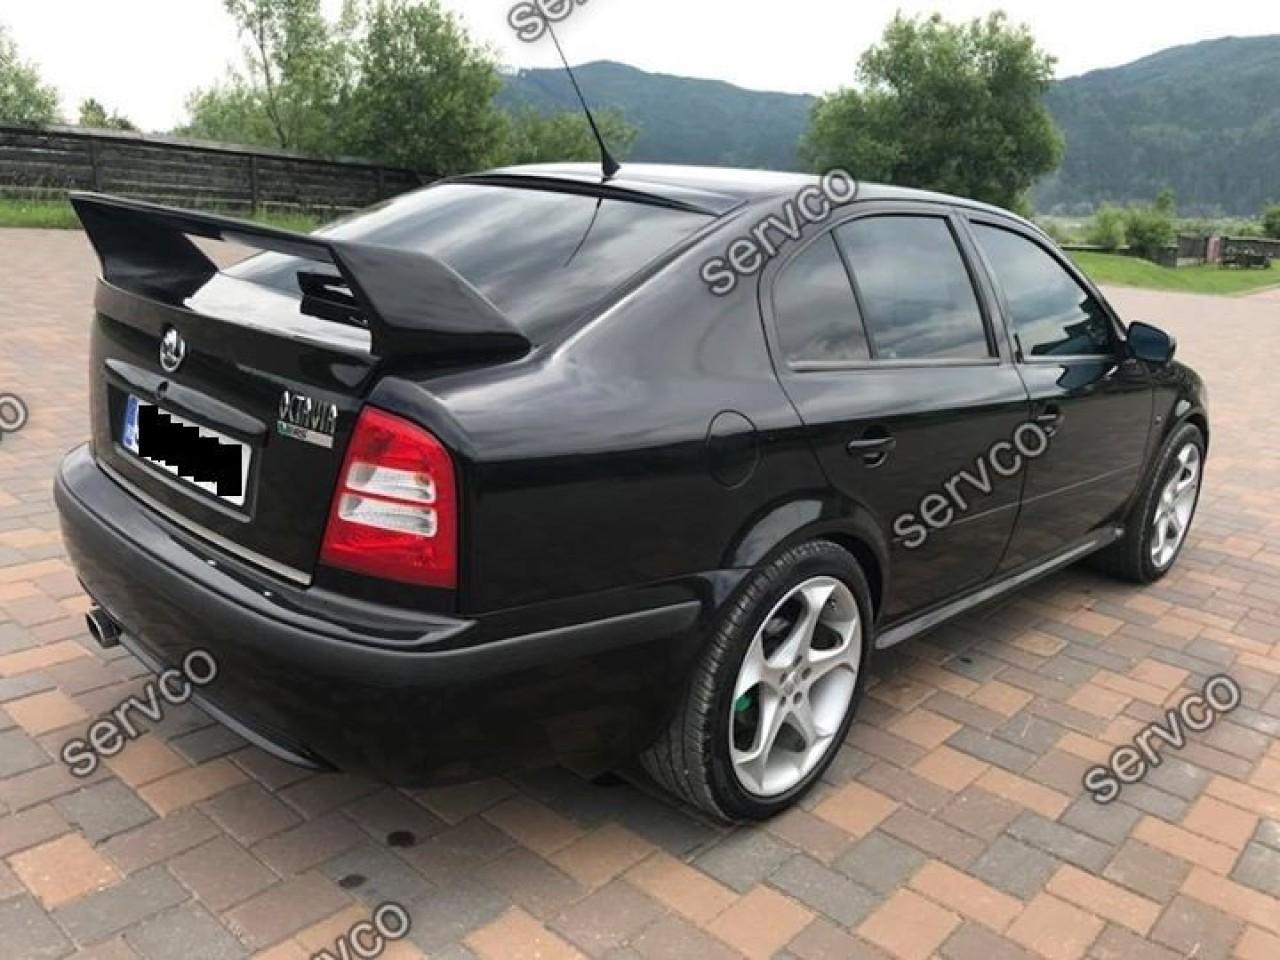 Eleron WRC RS Vrs portbagaj tuning sport Skoda Octavia 1 Mk1 1U 1996-2006 v13